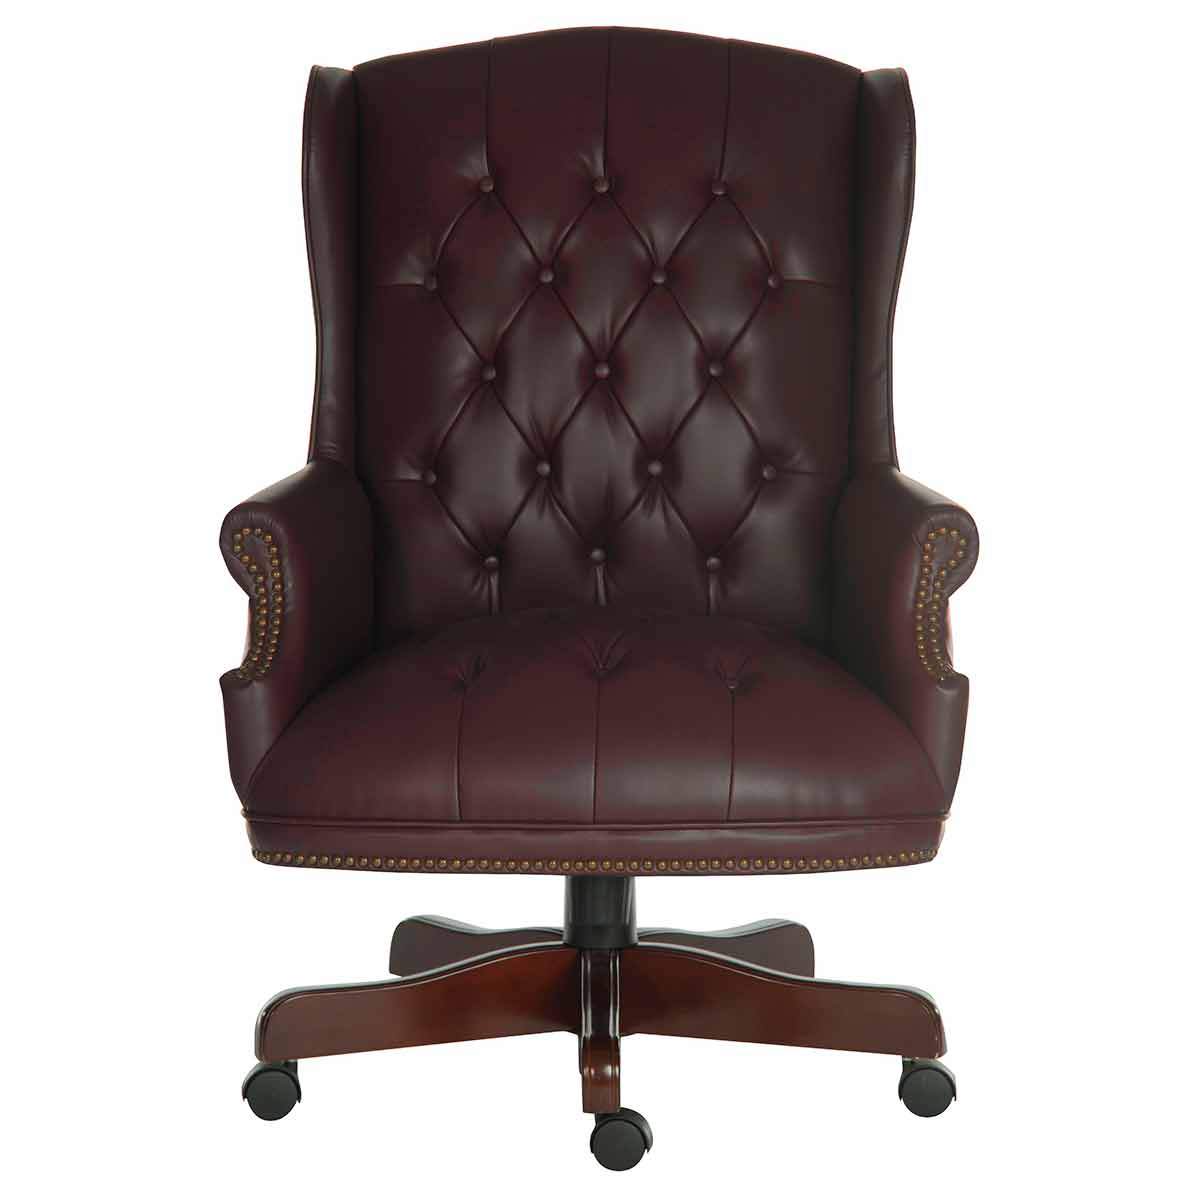 classic office chair. Classic Office Chair E